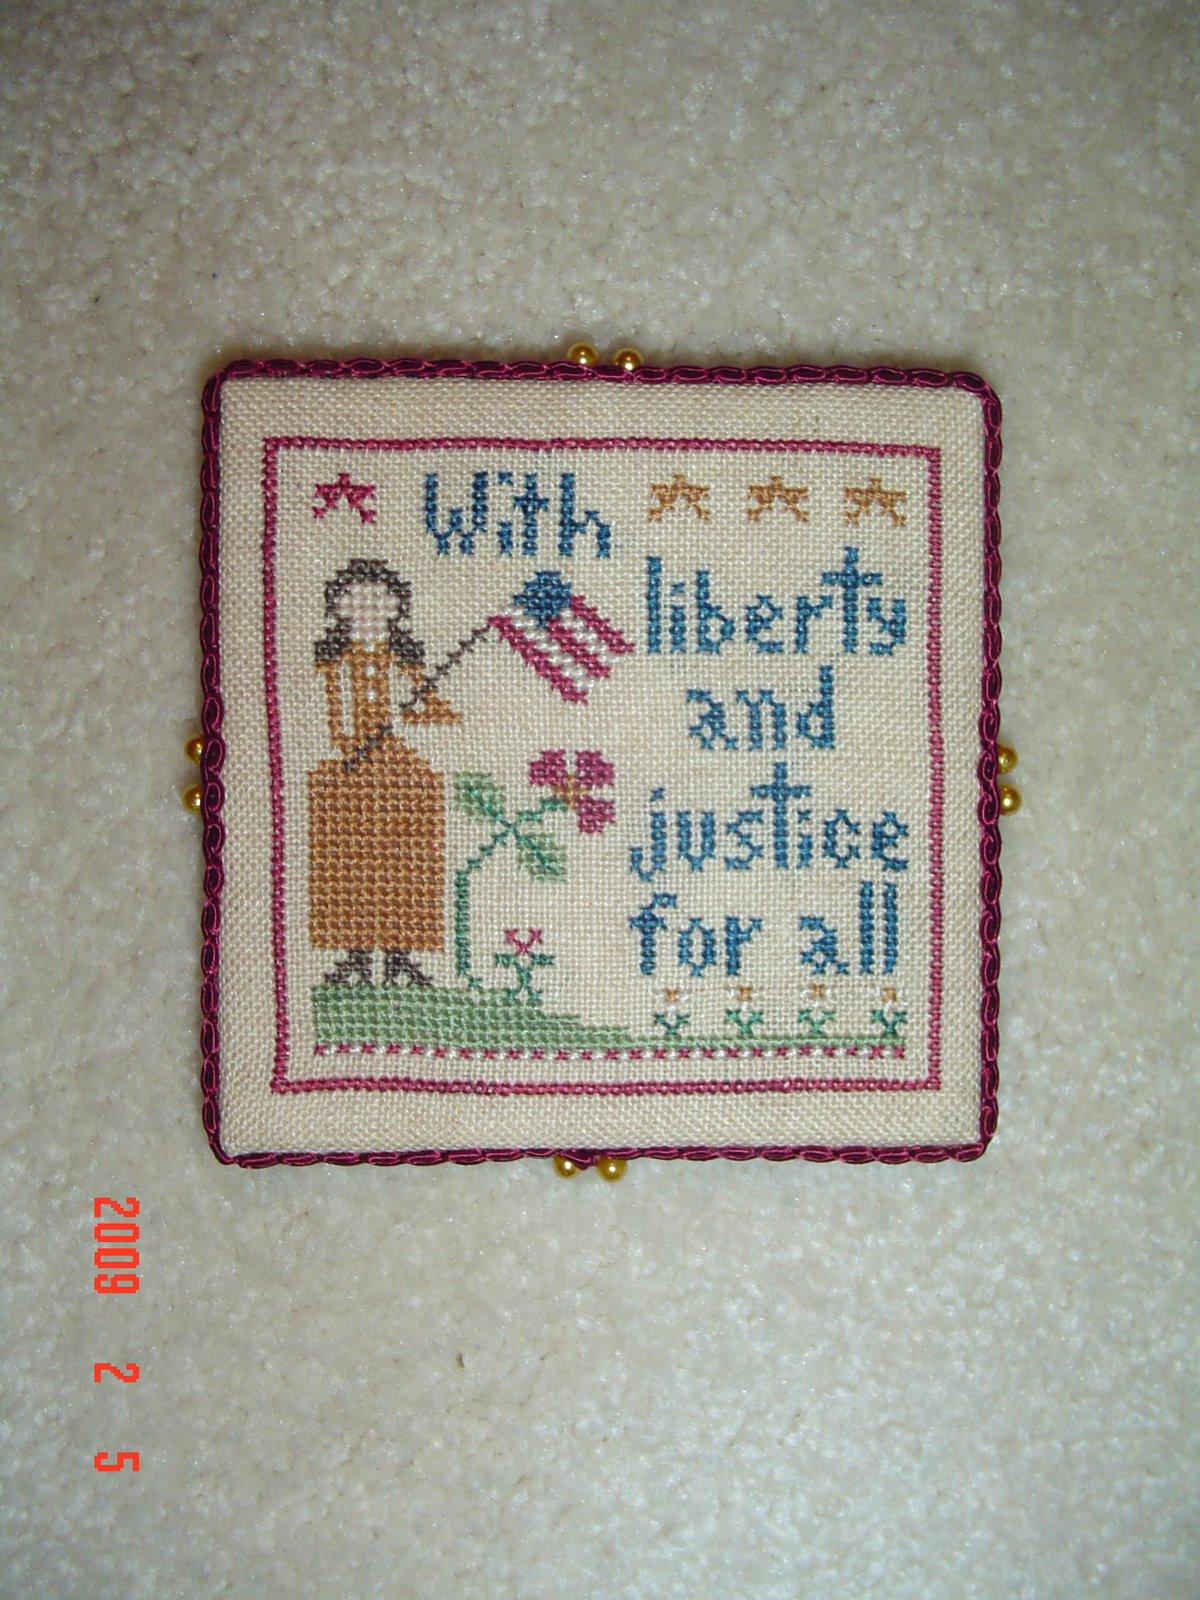 [jillpatrioticexch1.jpg]